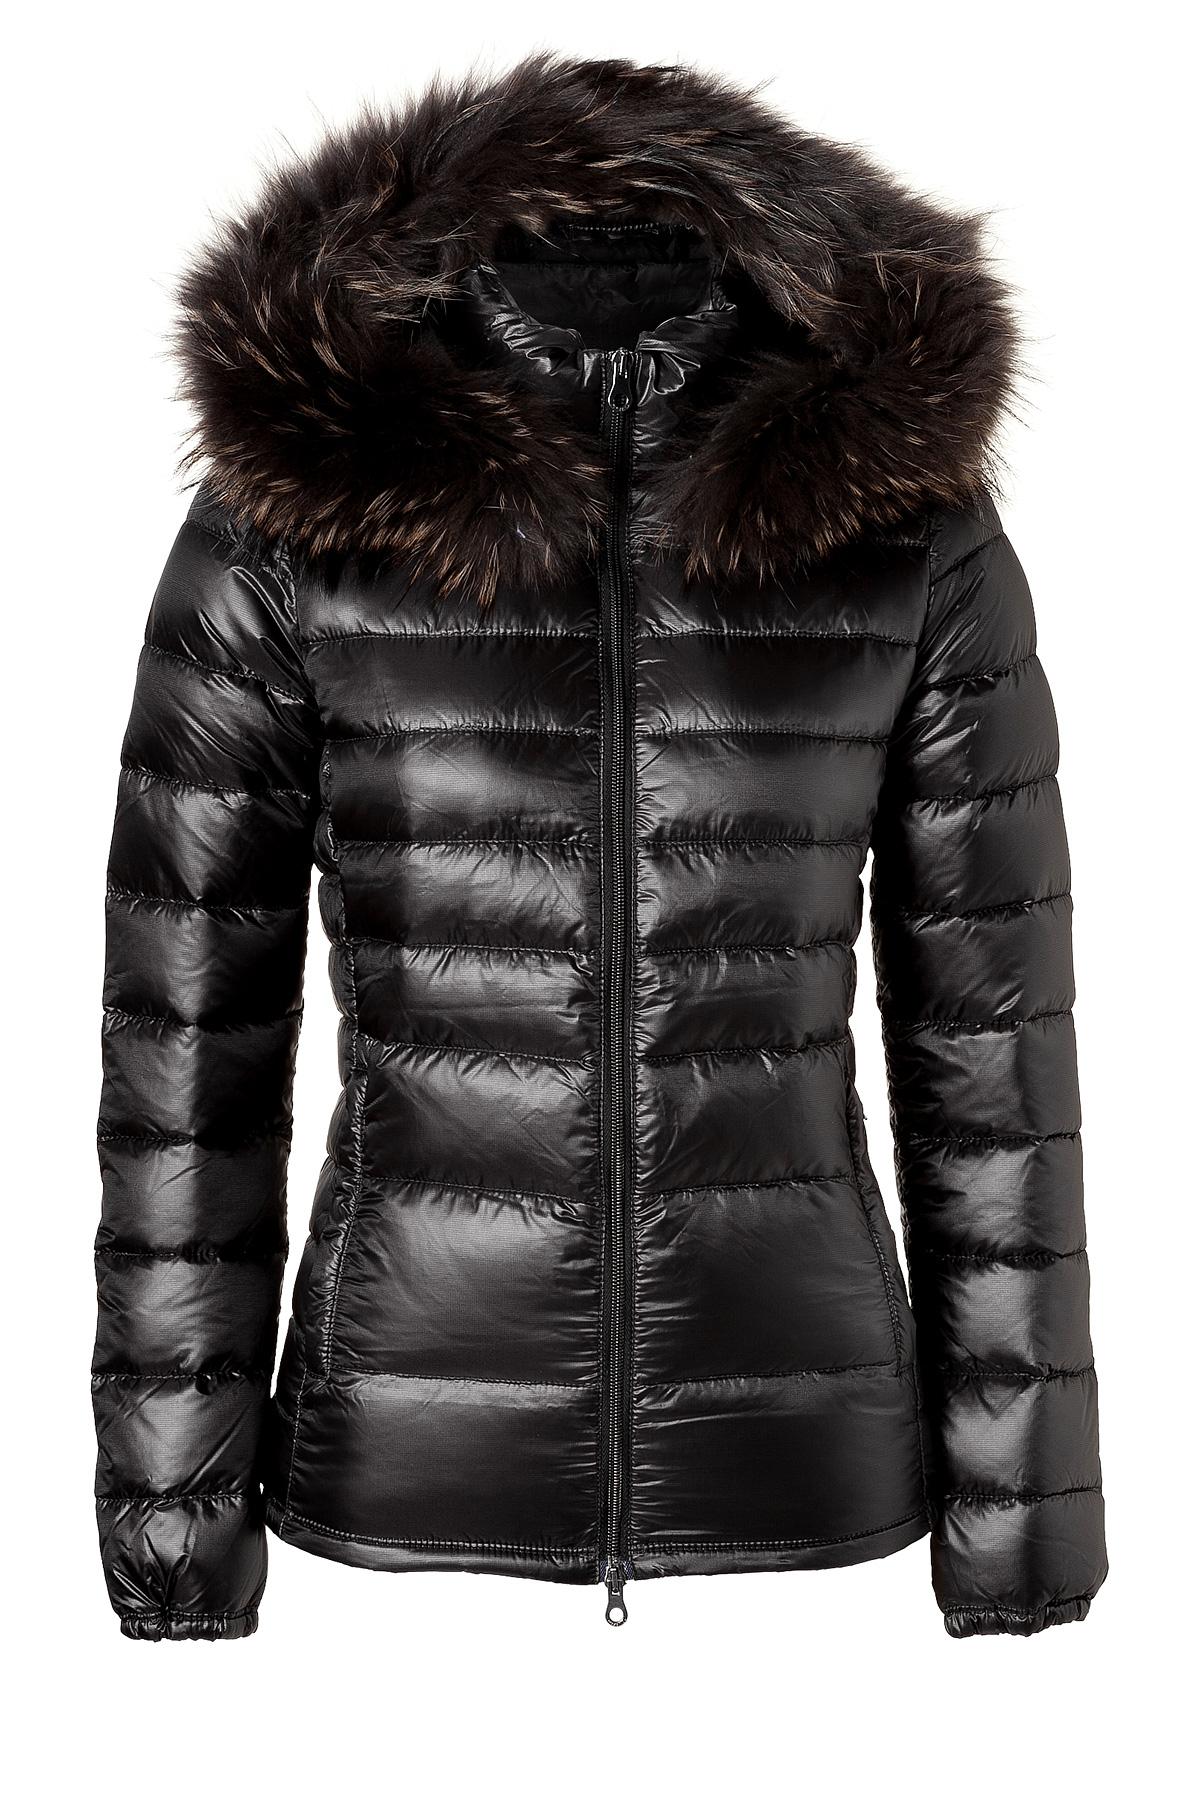 Duvetica Nefele Down Jacket